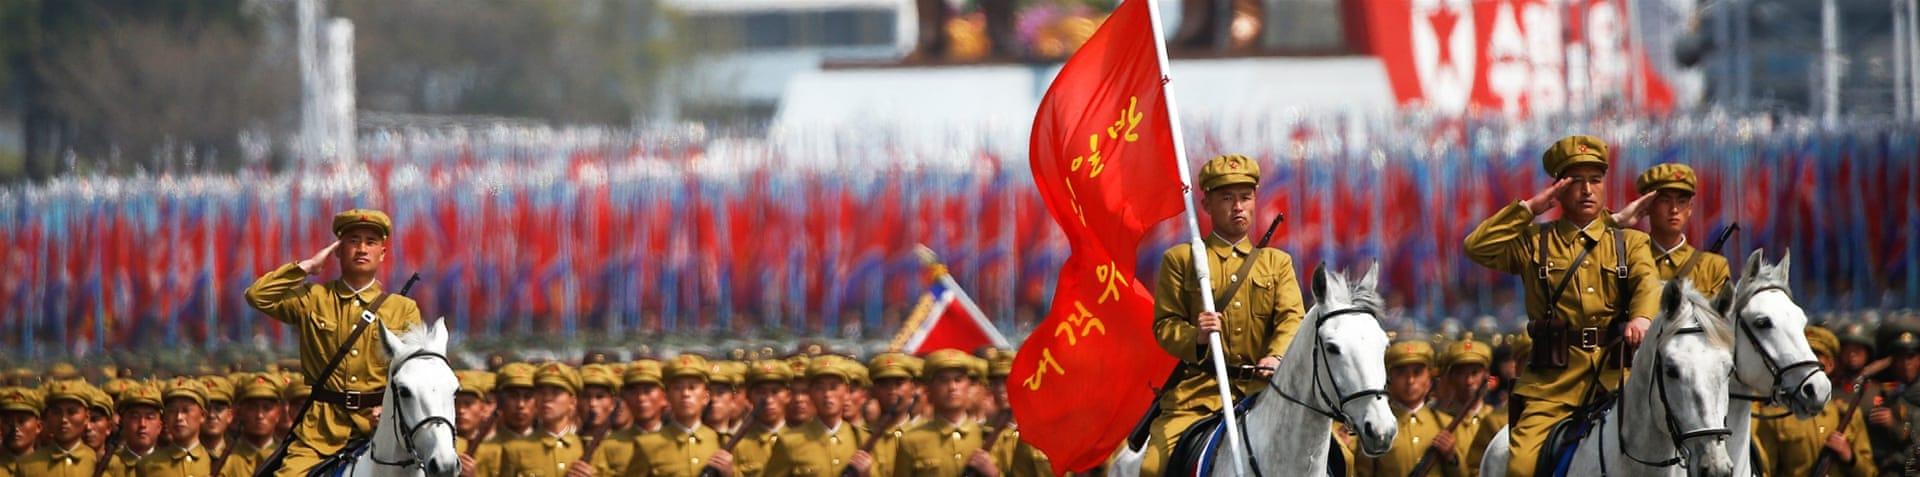 North Korea showcases new missiles at military parade